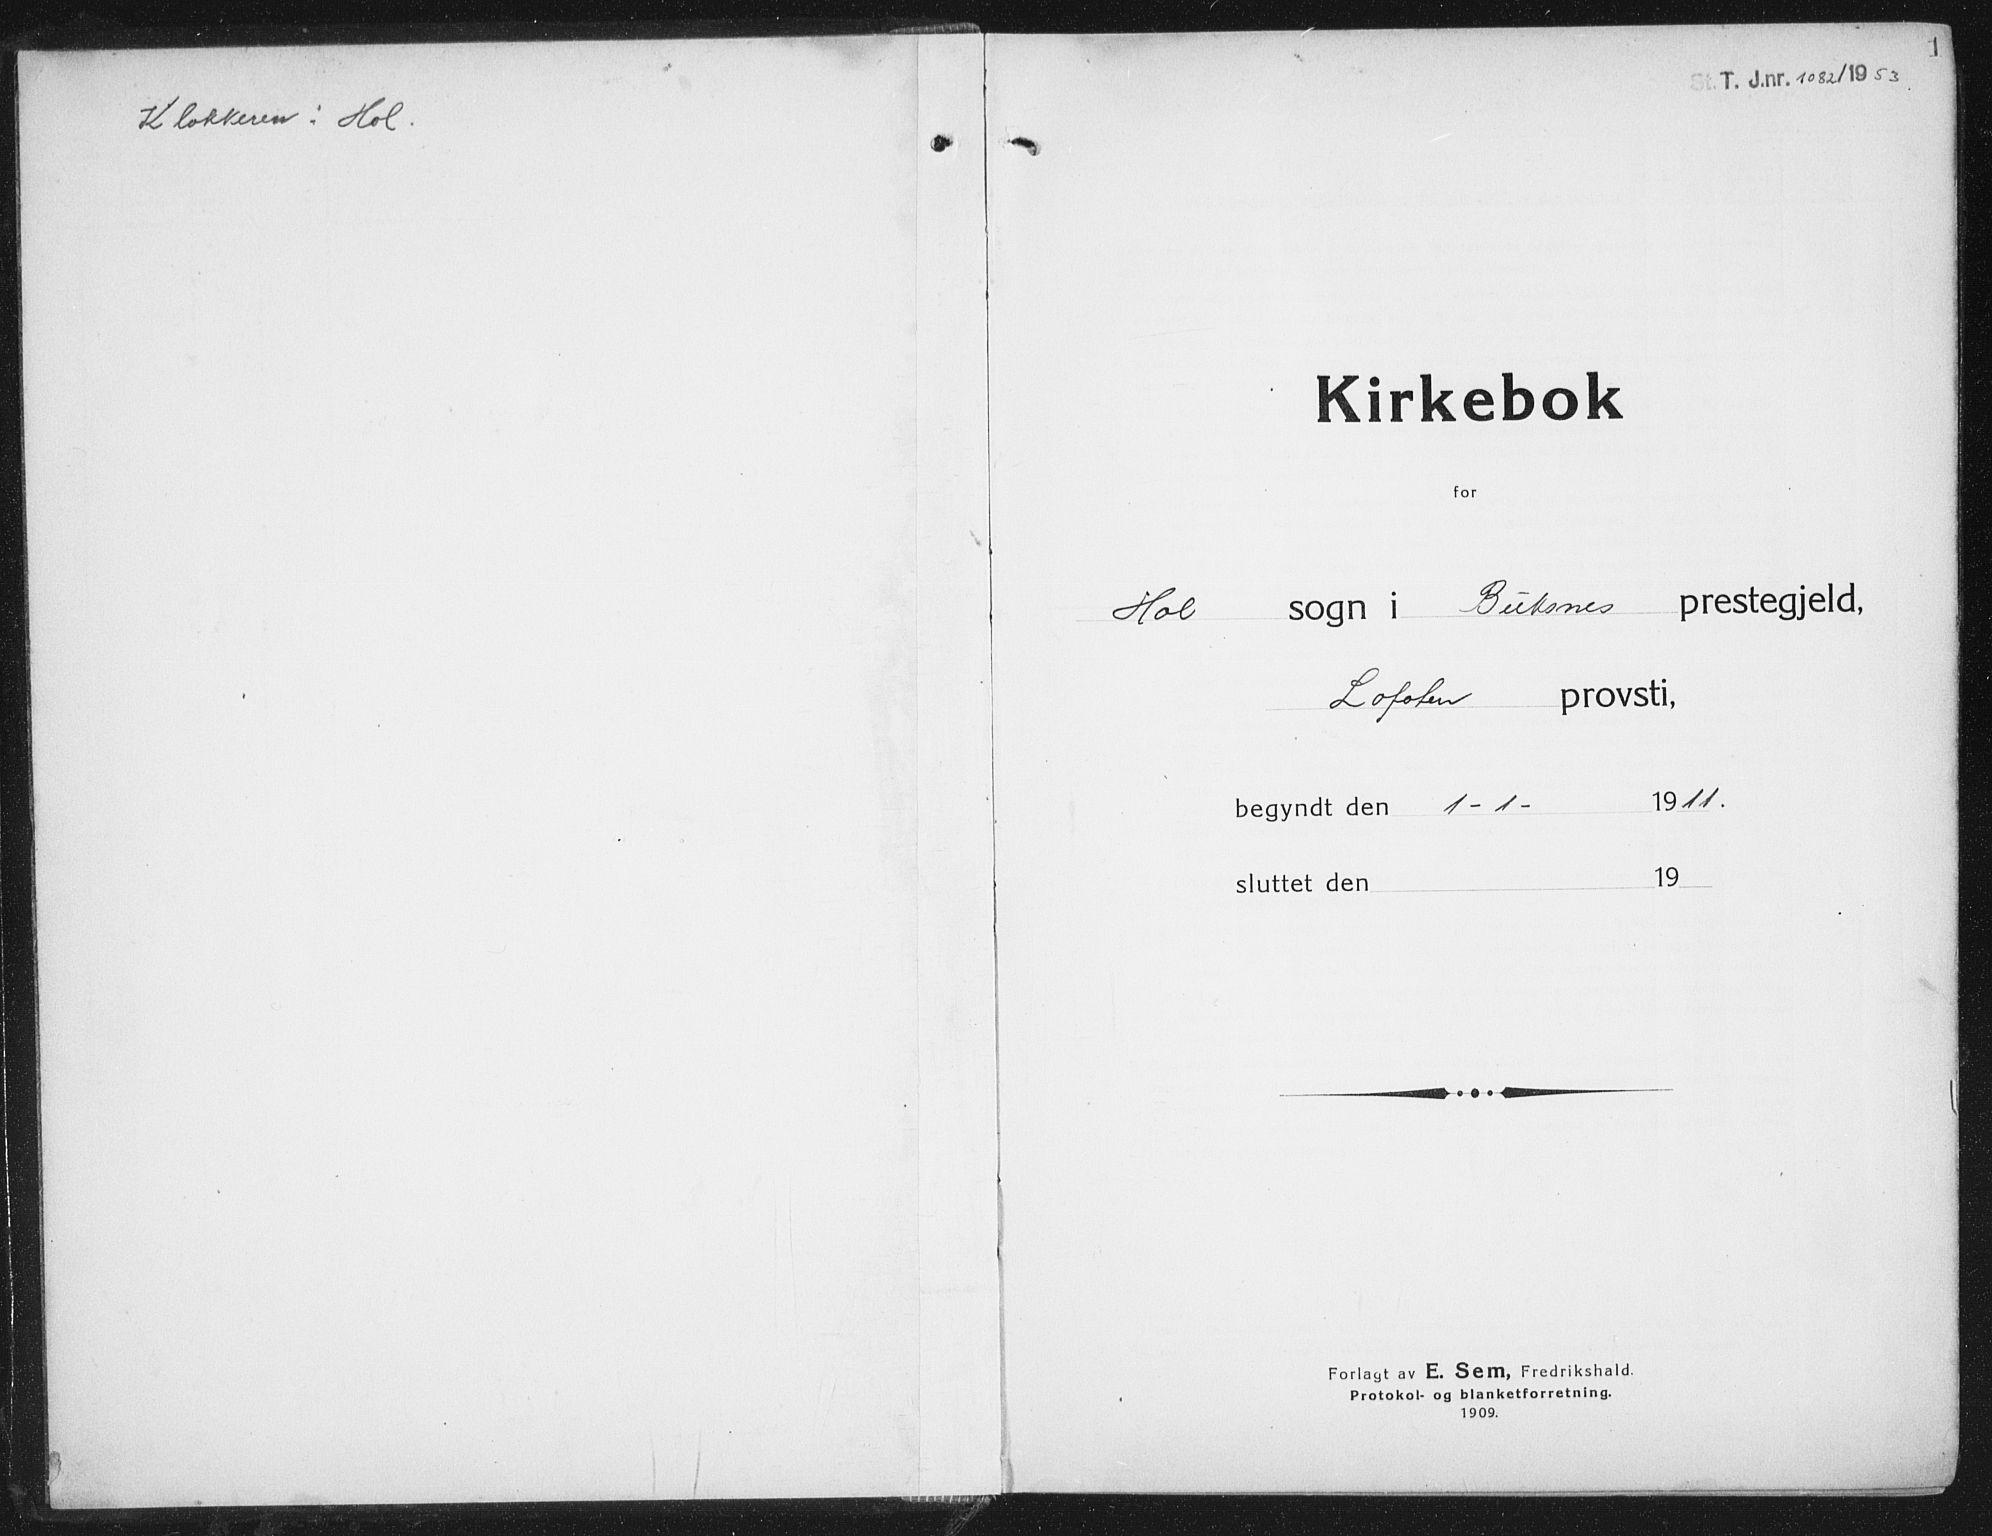 SAT, Ministerialprotokoller, klokkerbøker og fødselsregistre - Nordland, 882/L1183: Klokkerbok nr. 882C01, 1911-1938, s. 1